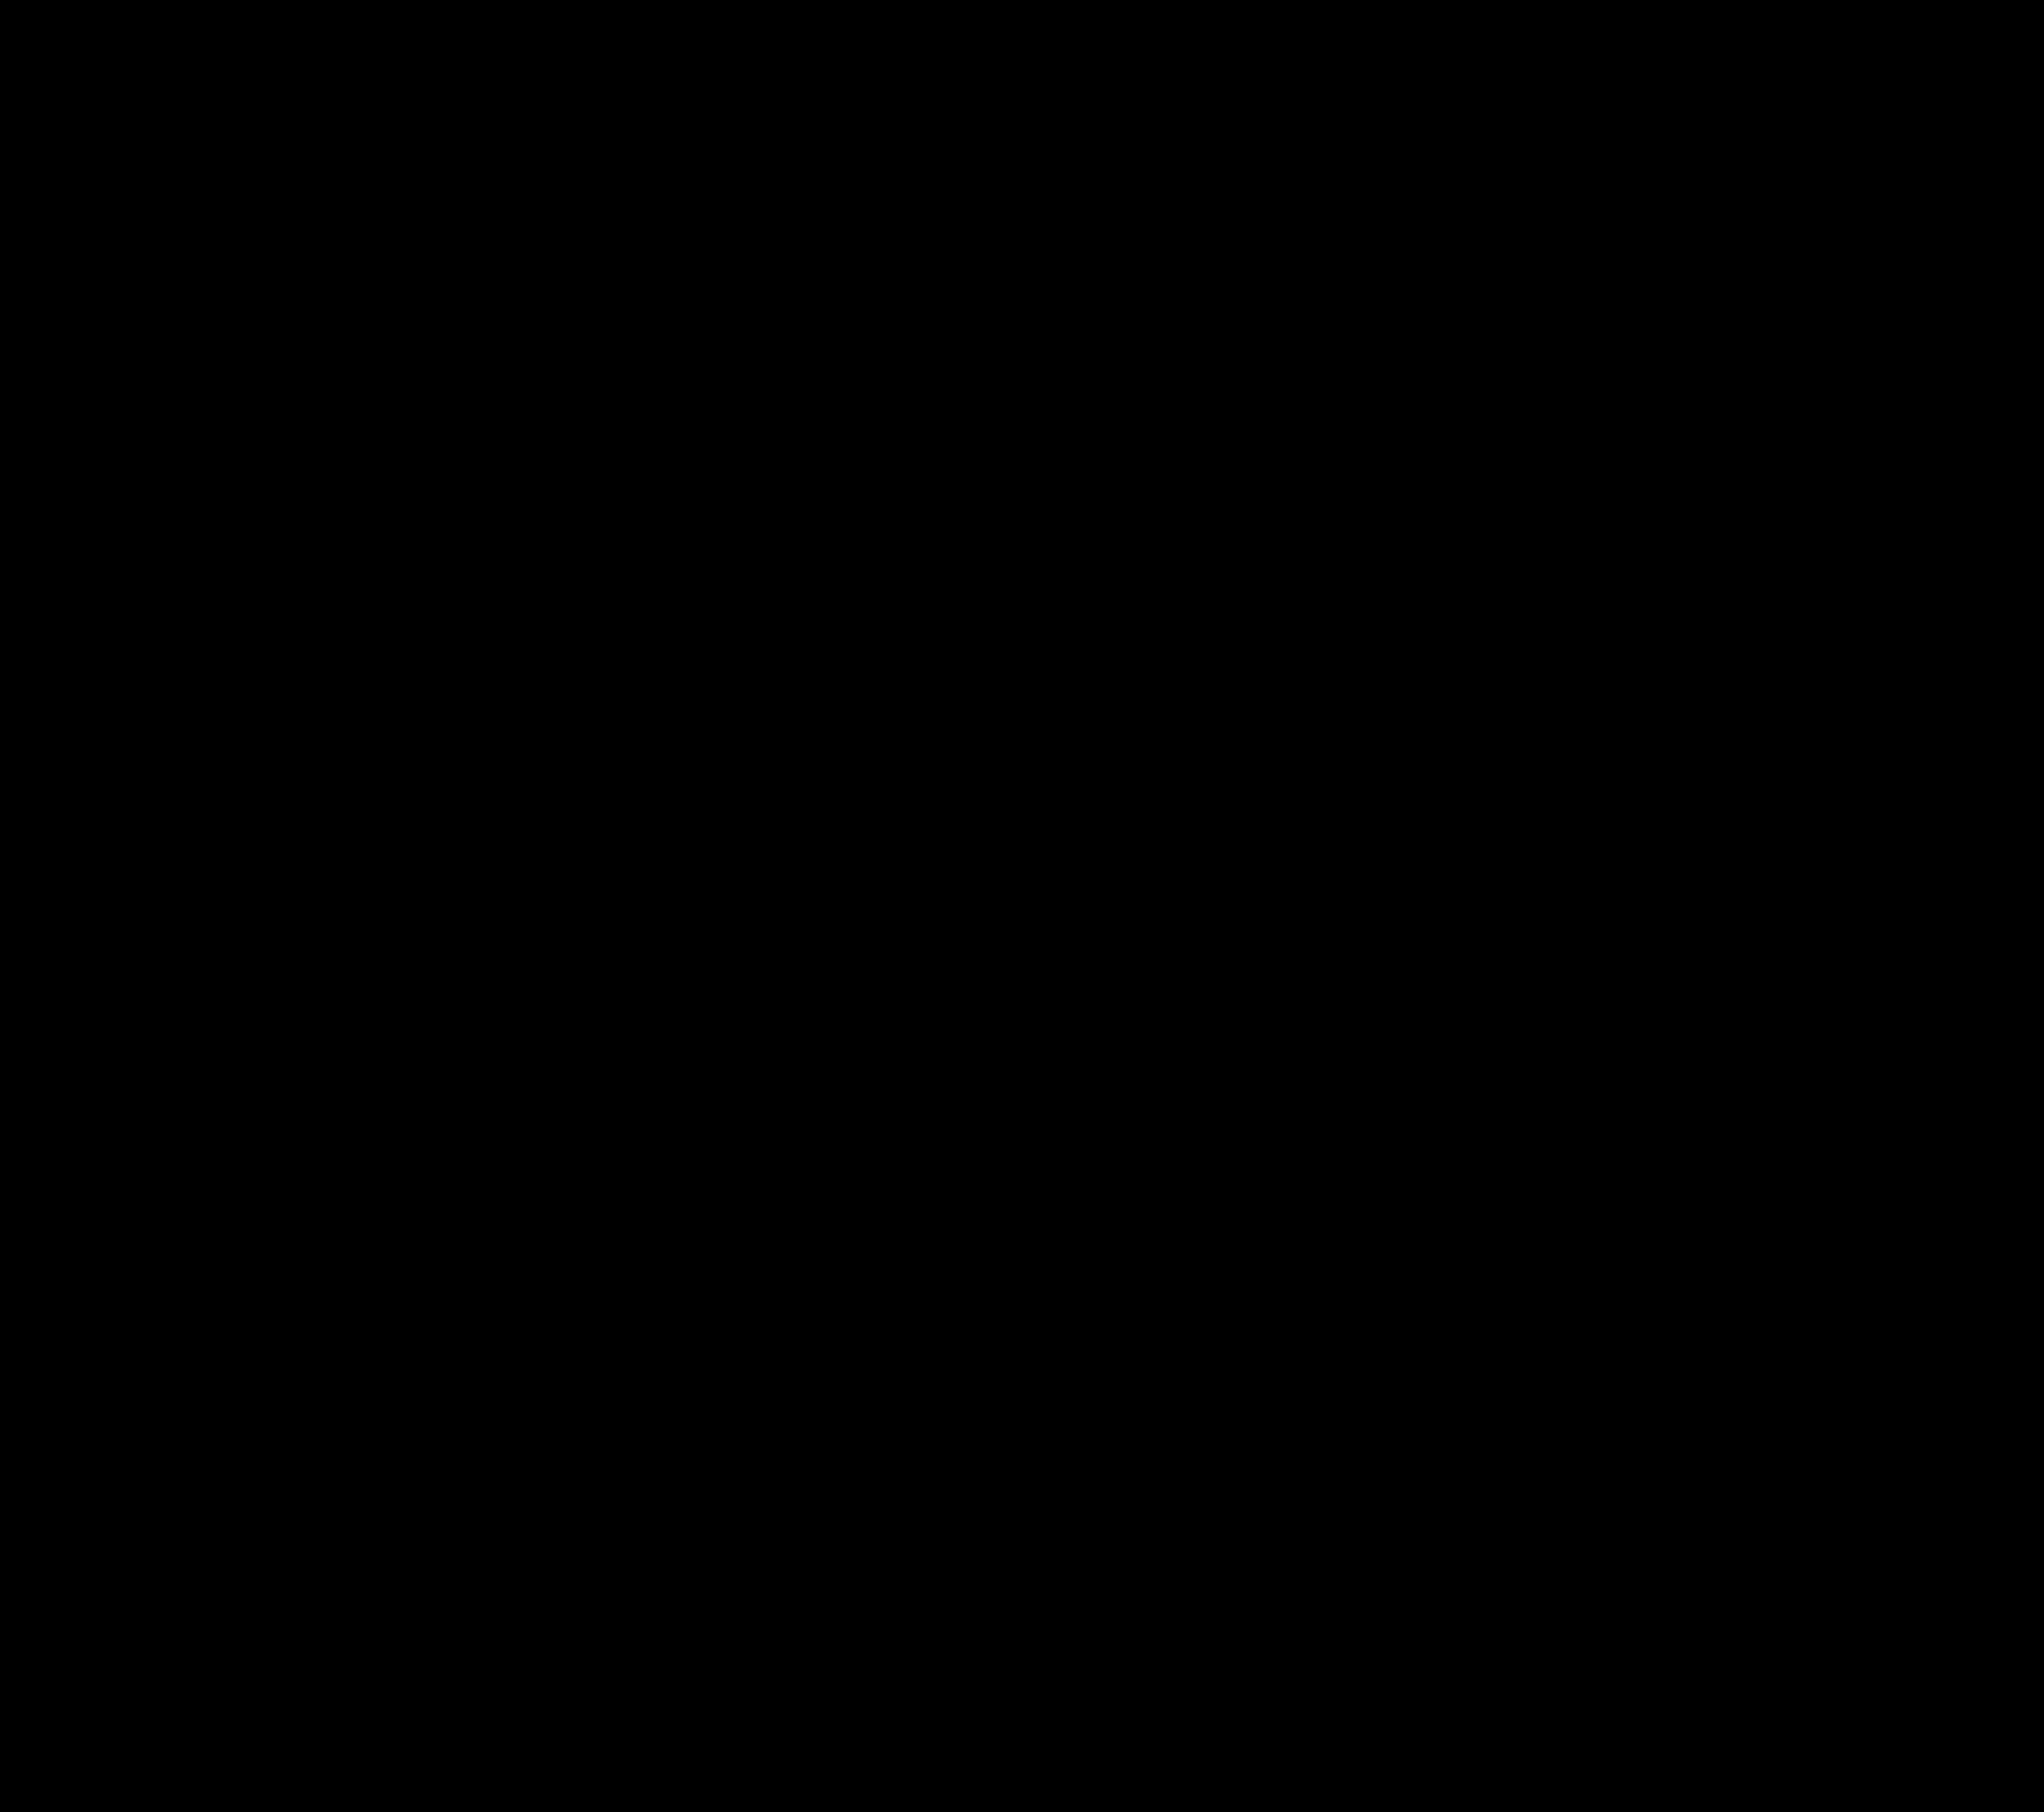 img-0882